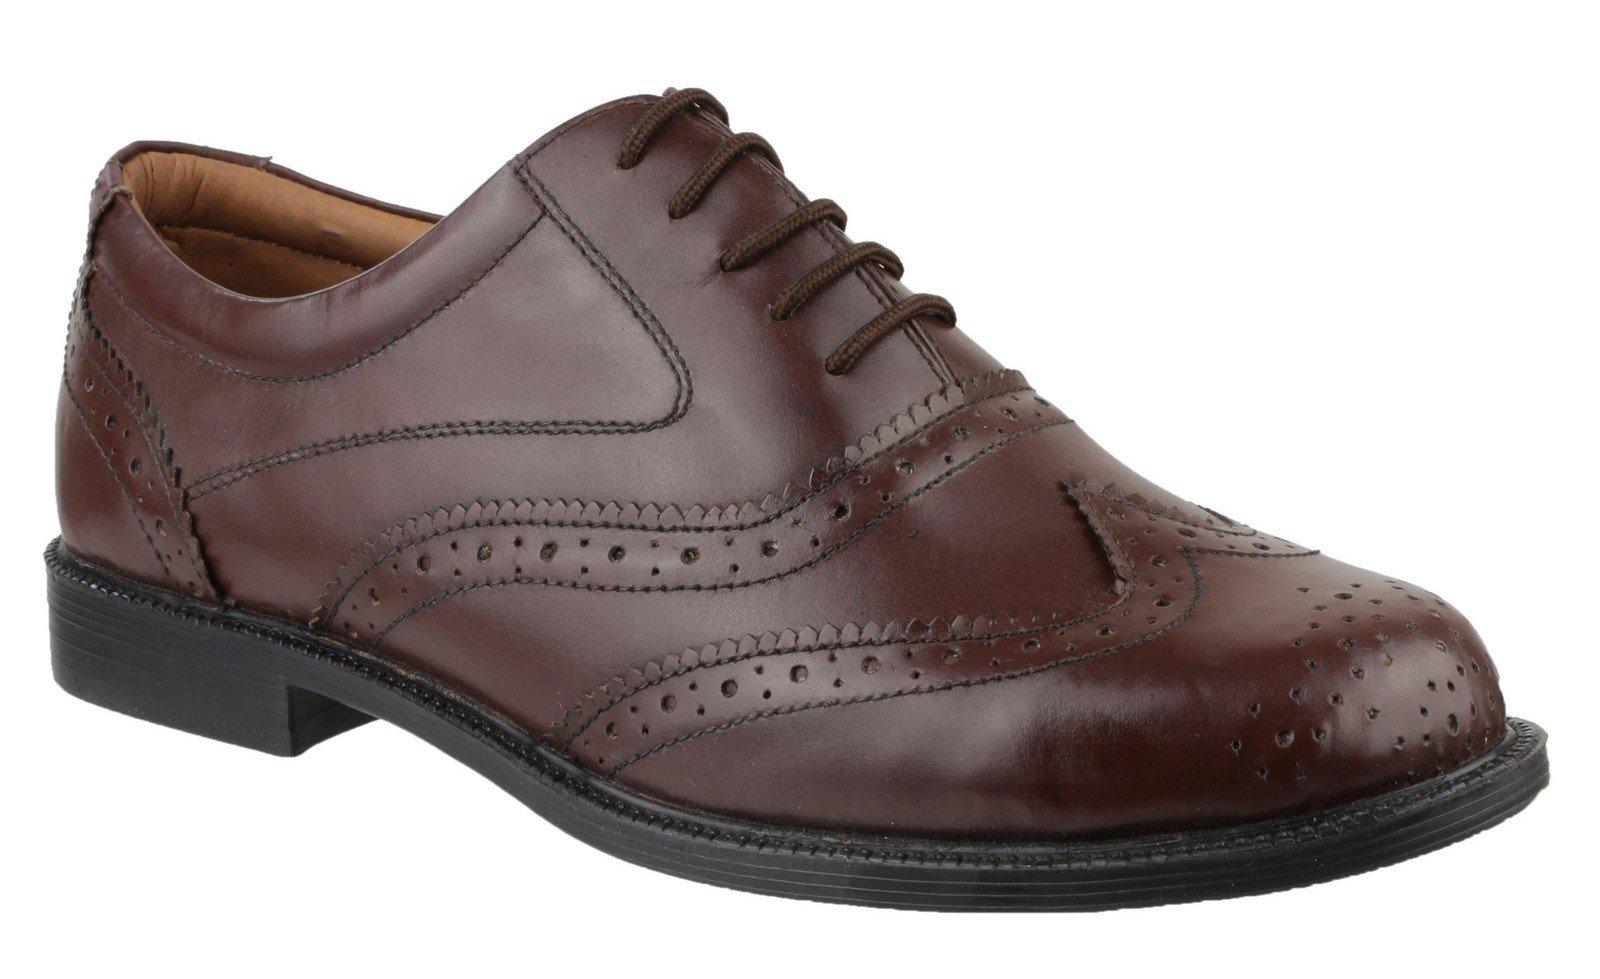 Amblers Men's Liverpool Oxford Brogue Black 11762 - Brown 6